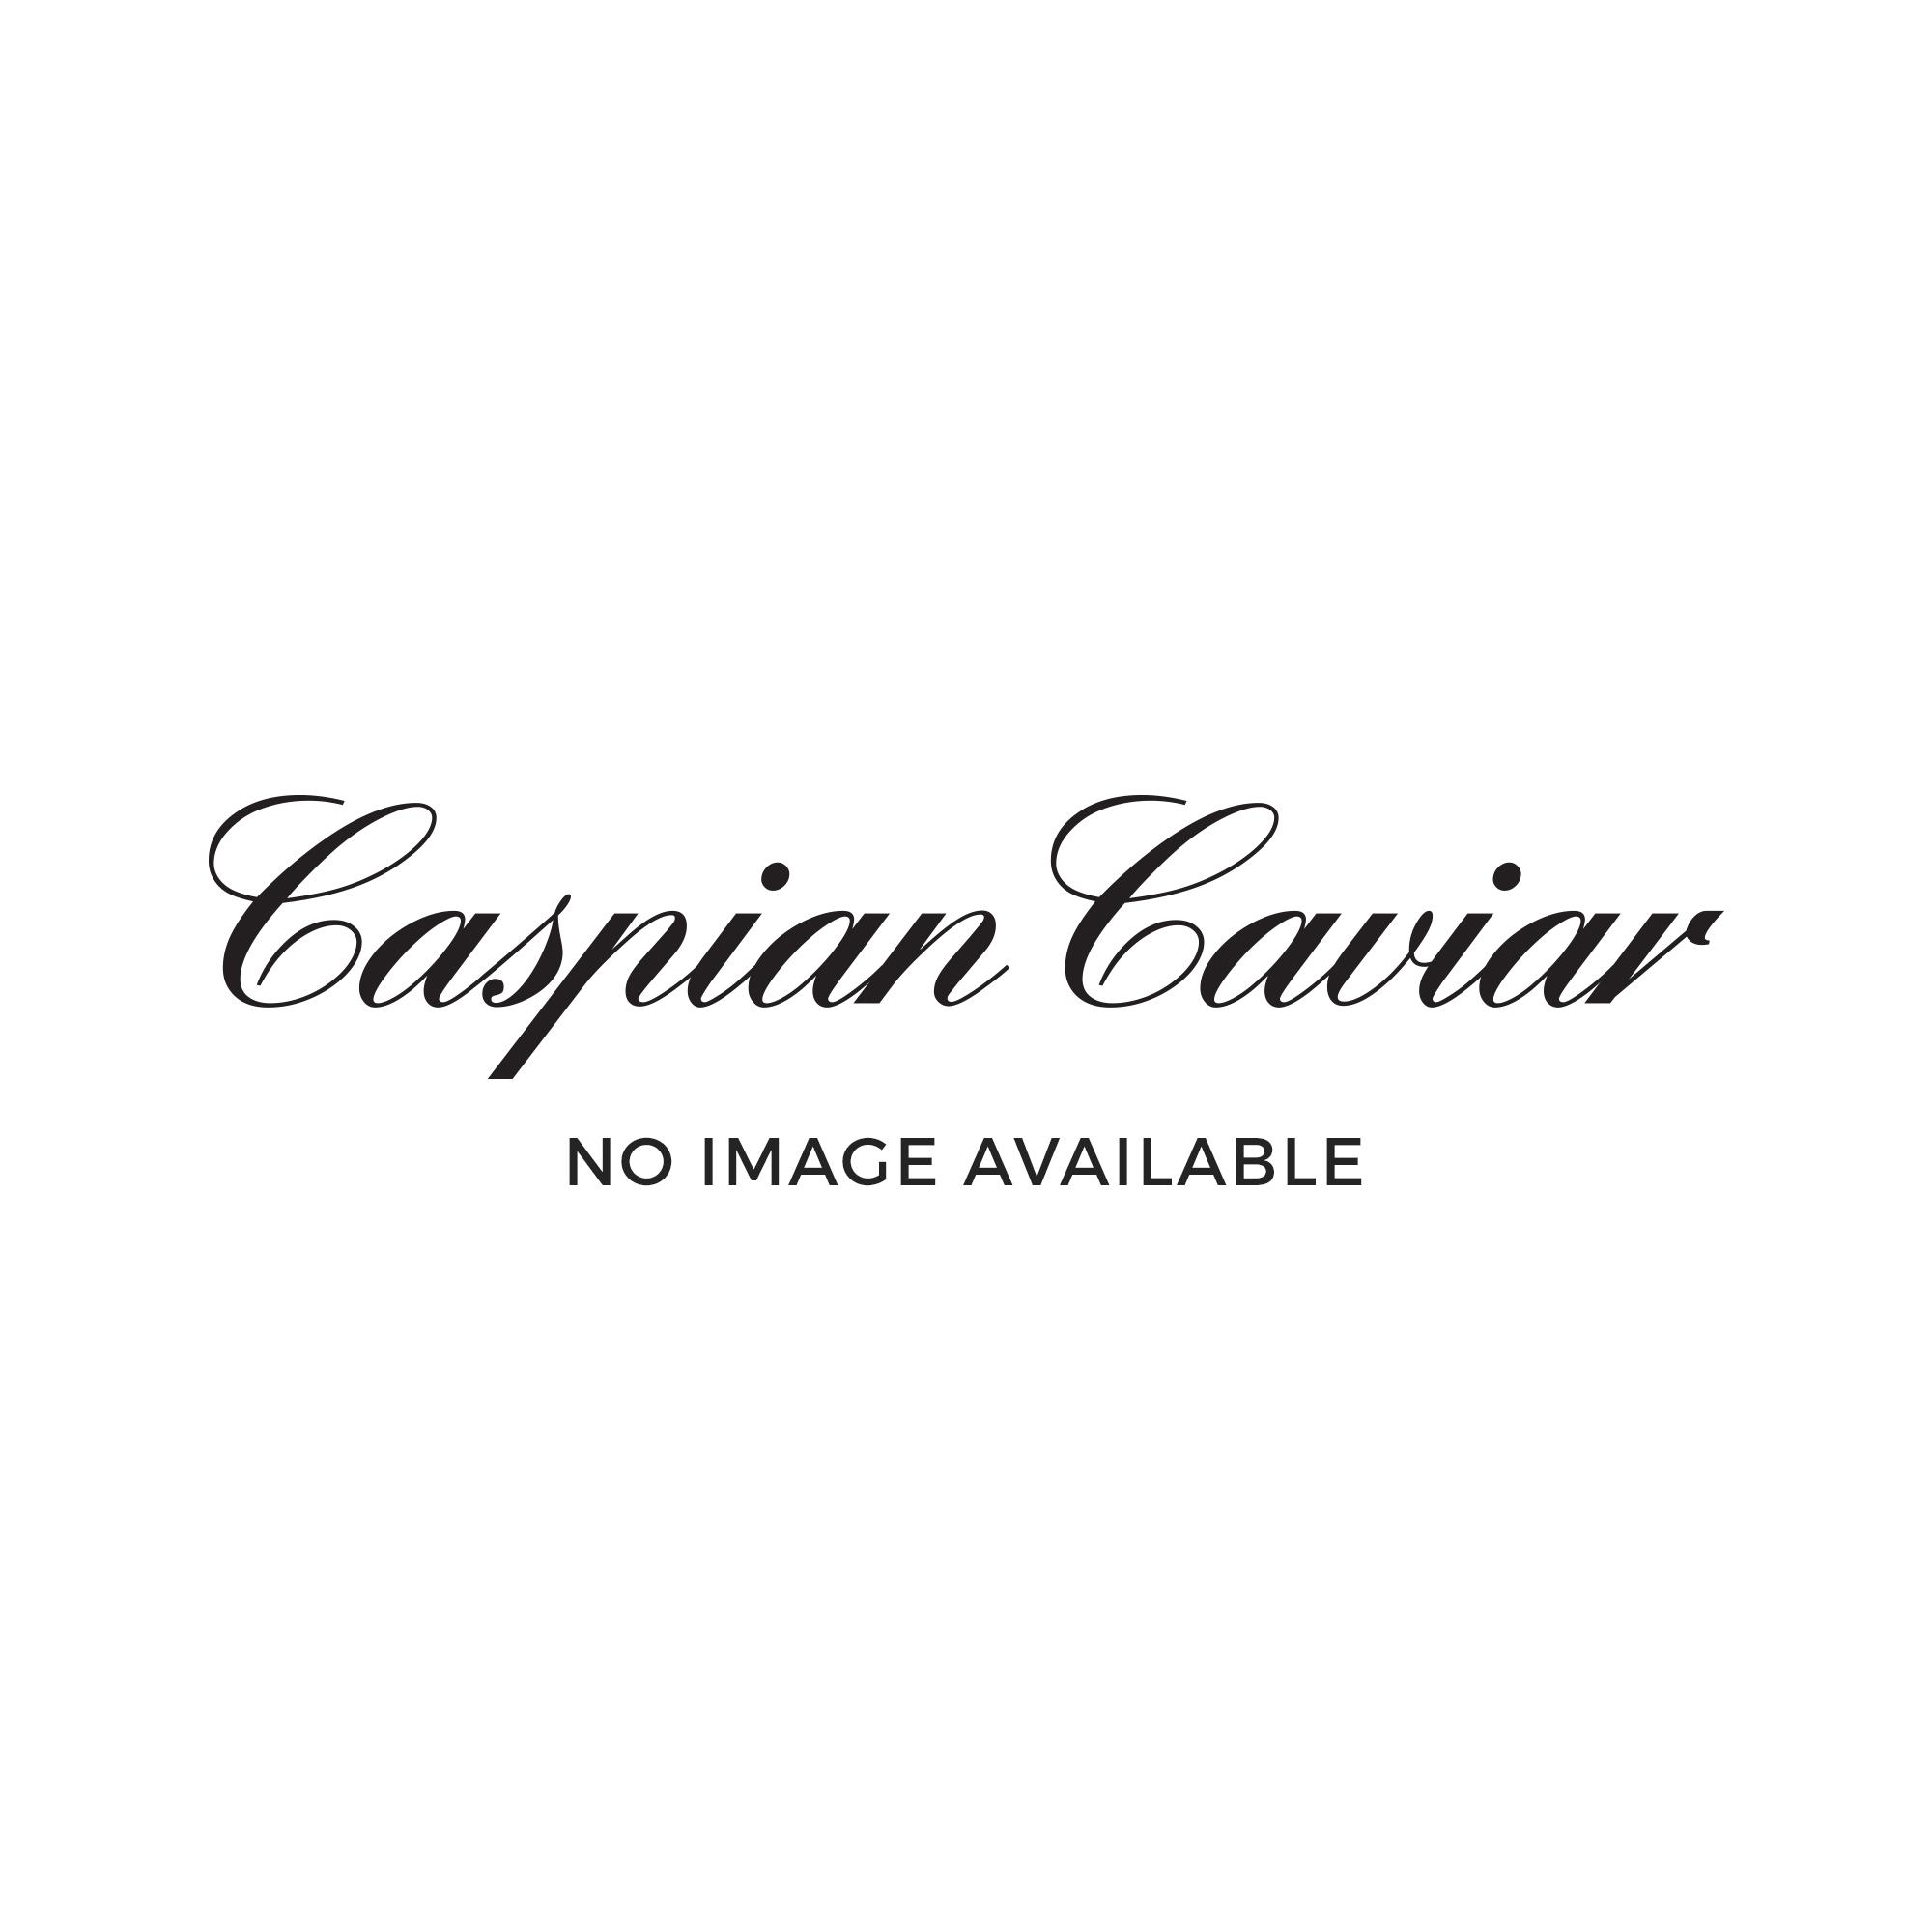 Caspian Caviar White 50g